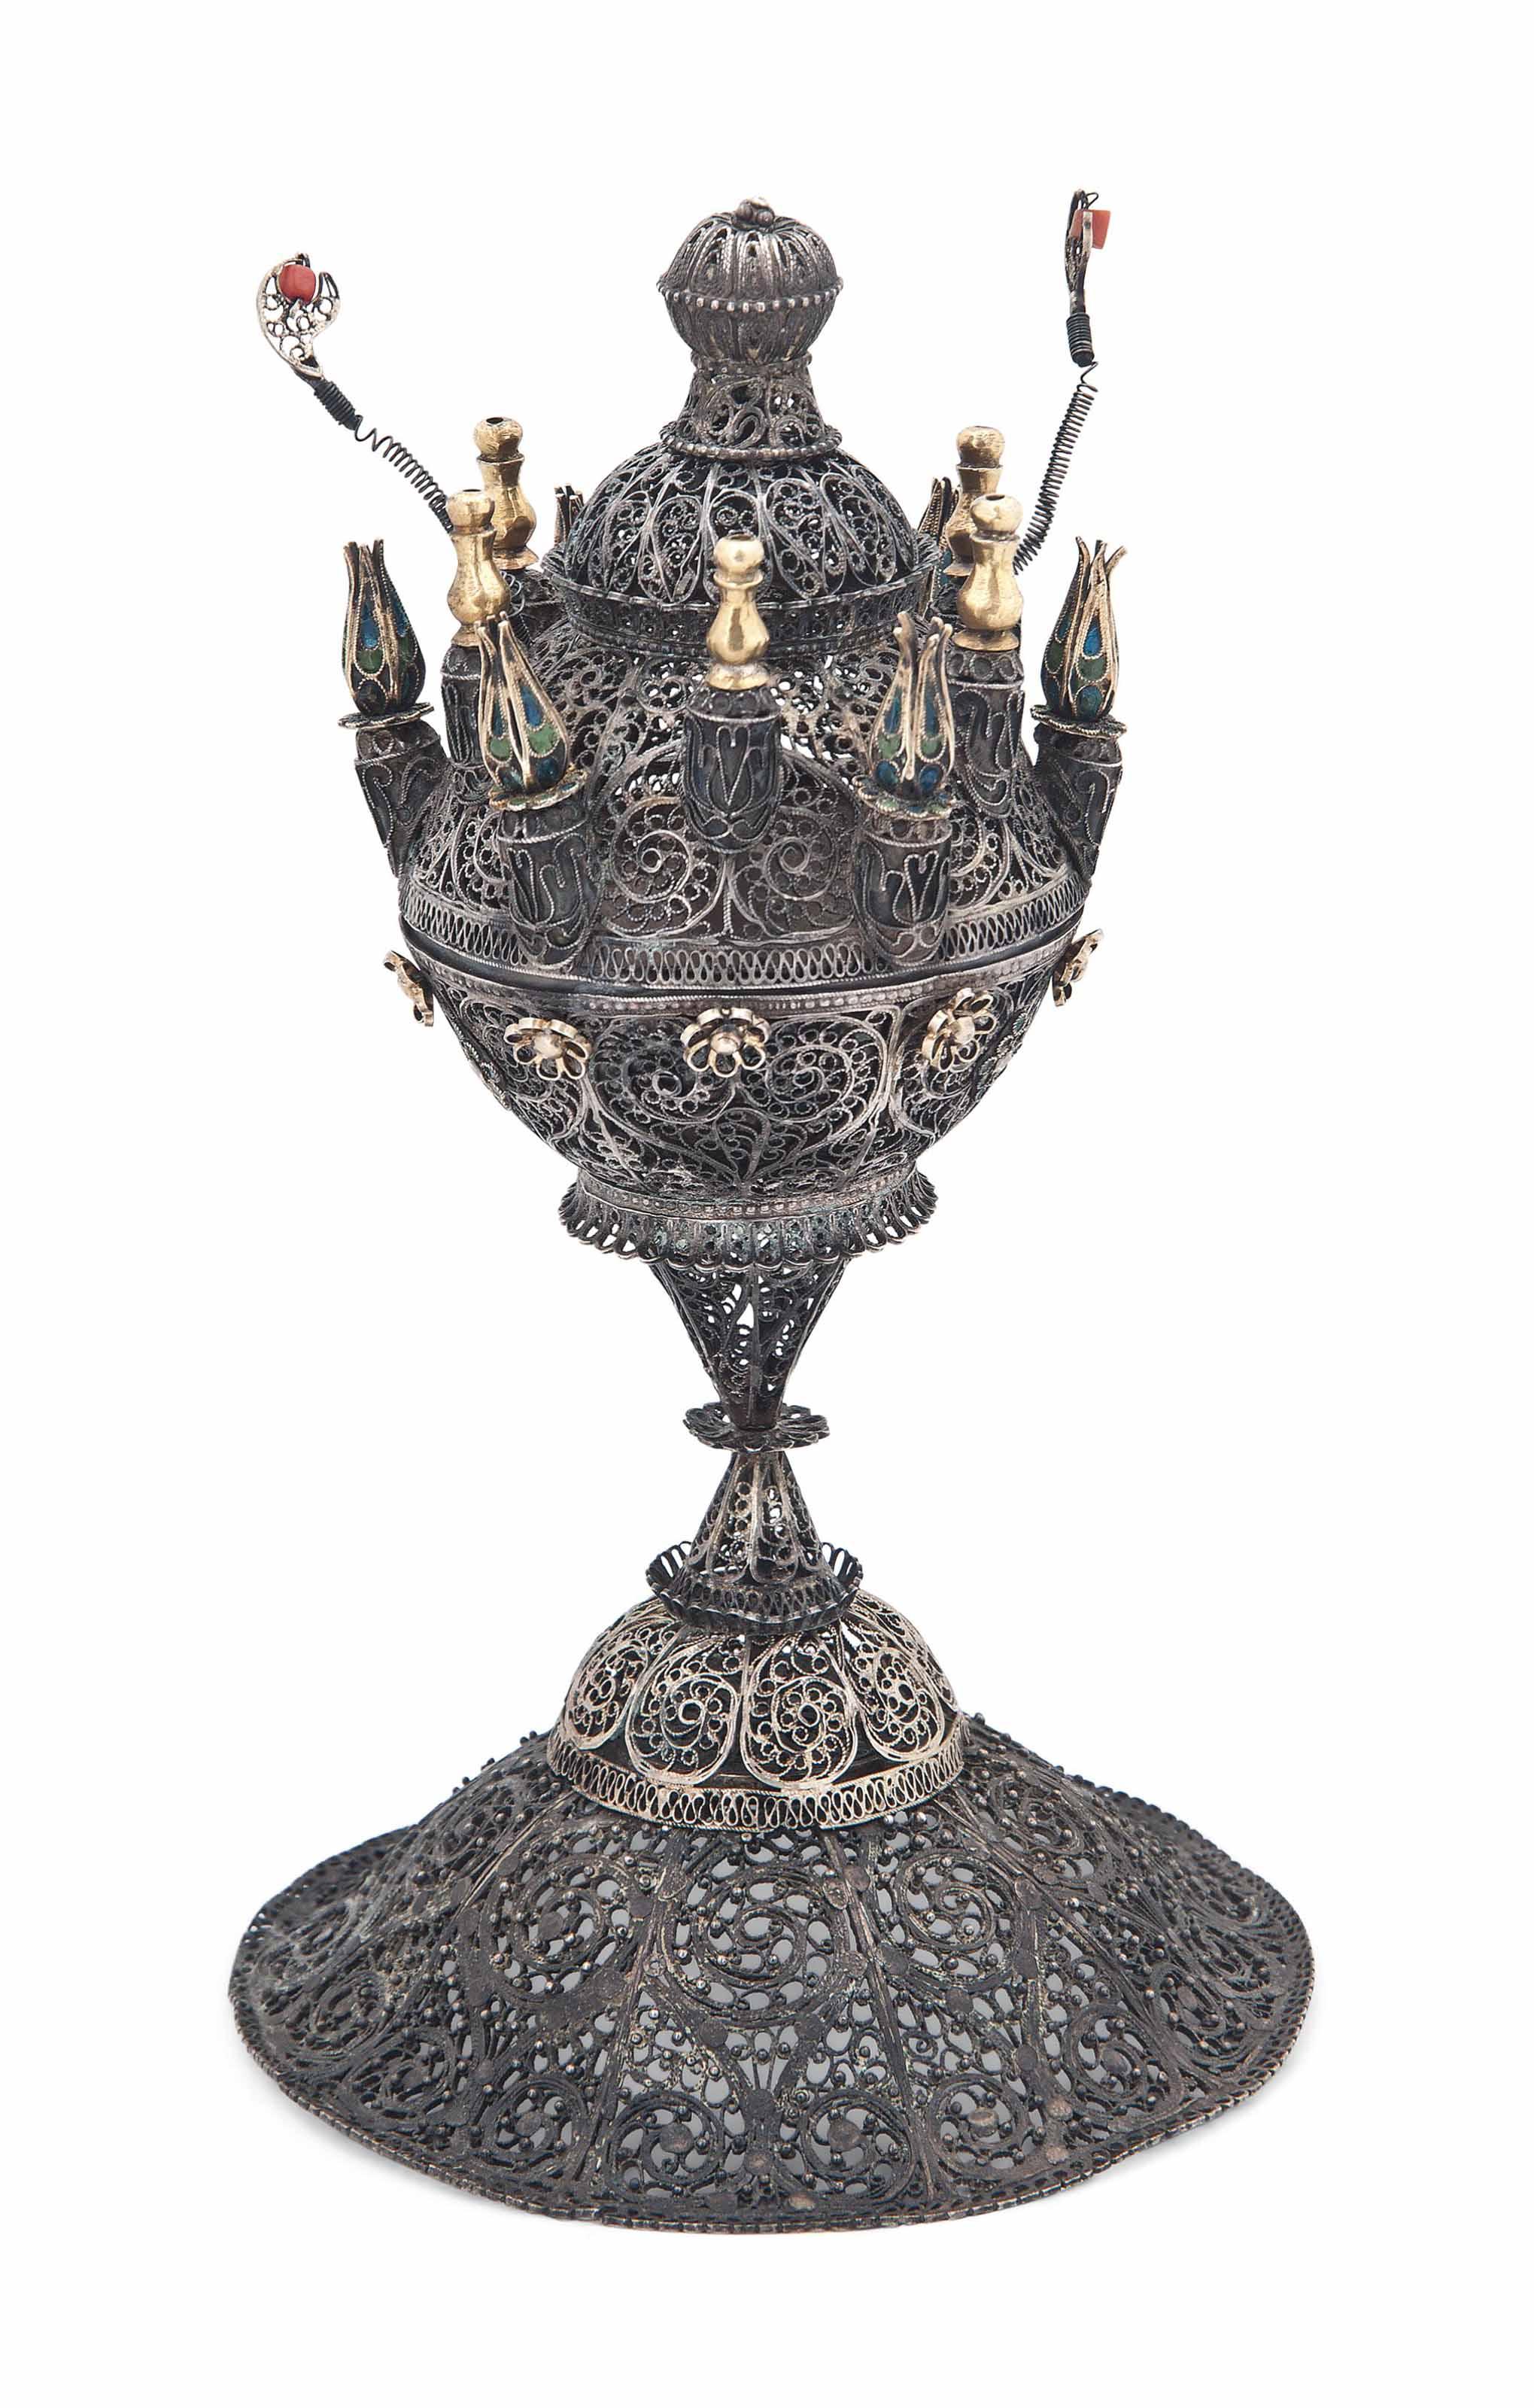 A FINE ARMENIAN PARCEL-GILT ENAMELLED SILVER FILIGREE CENSER